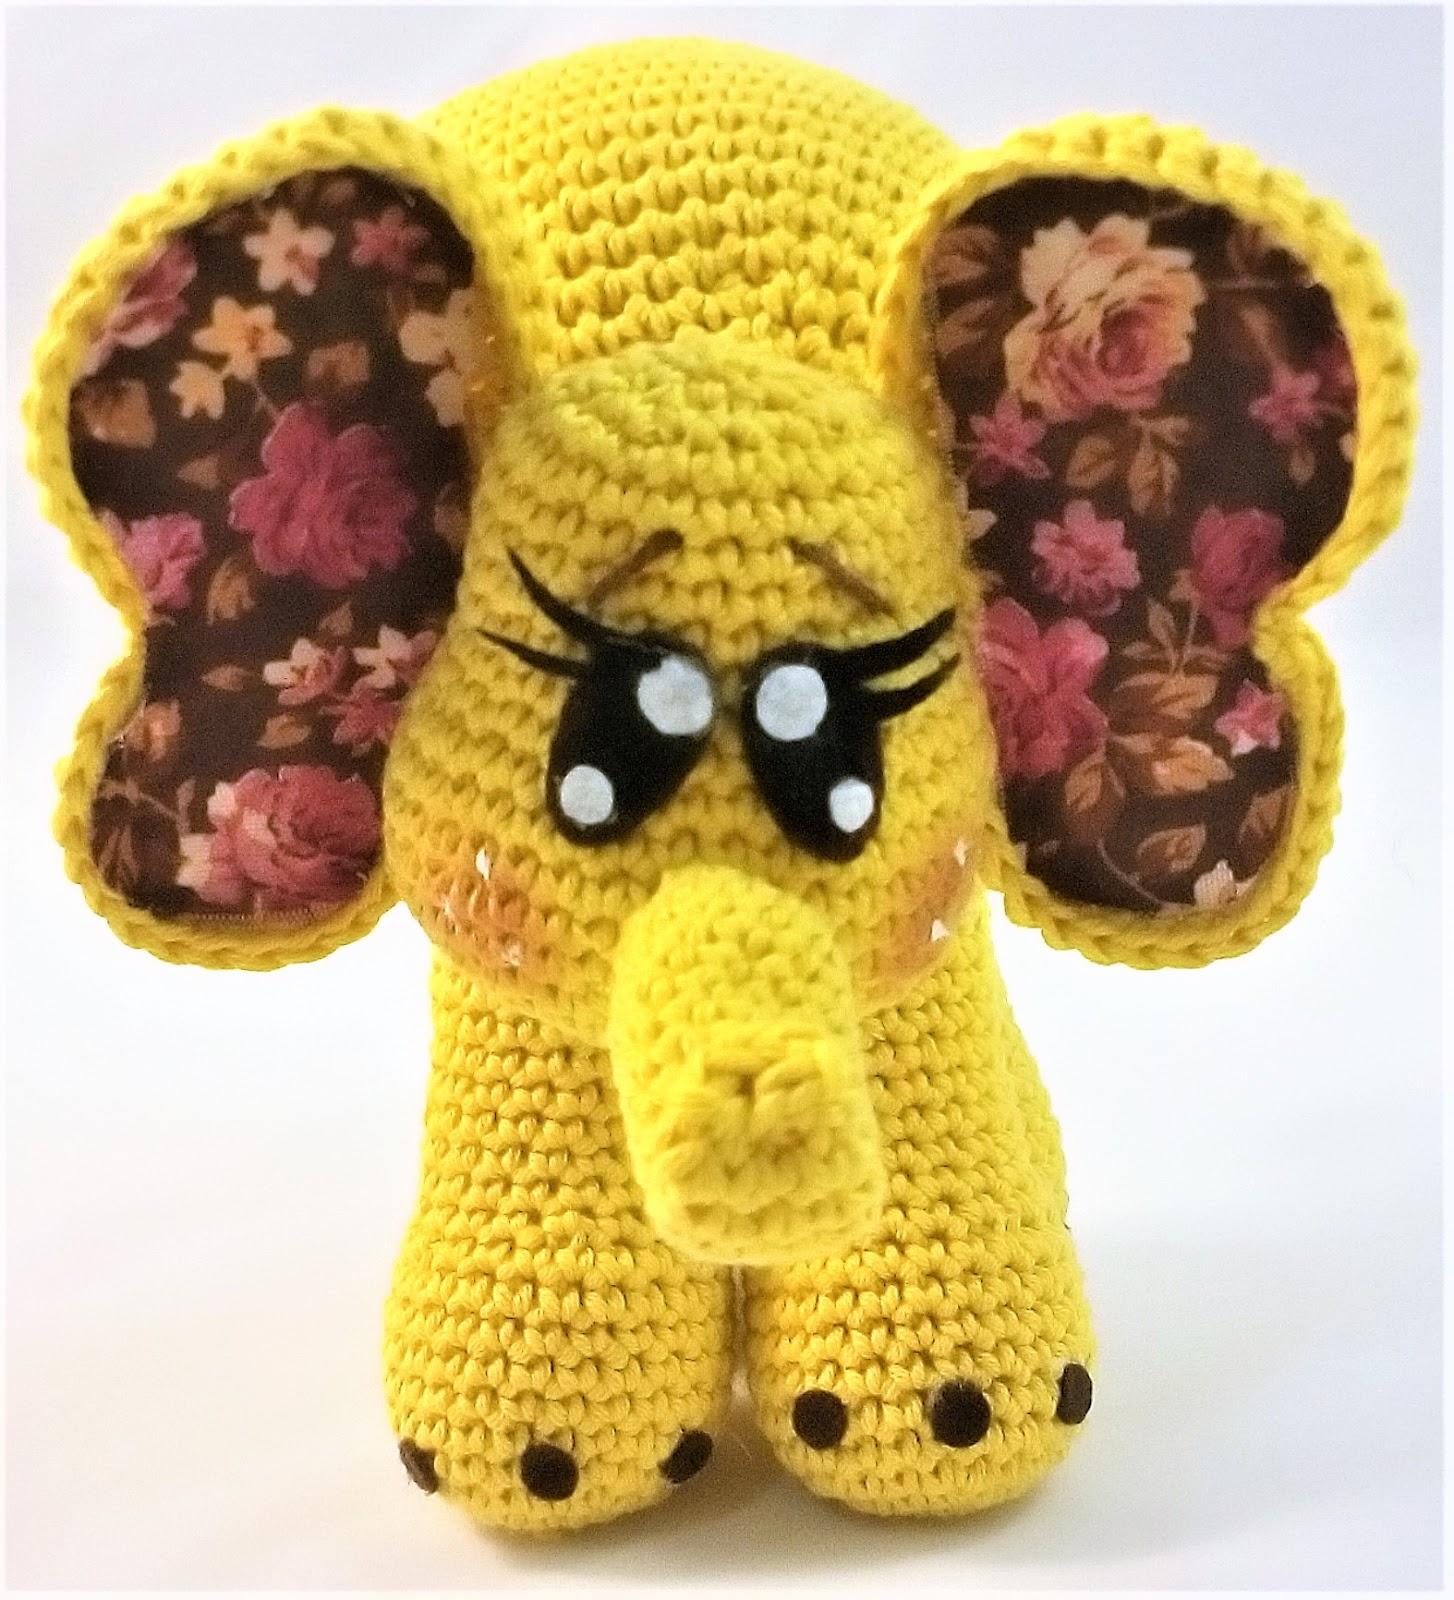 Elefante Amigurumi Crochet patrón PDF muñeca por LisaJestesDesigns ... | 1600x1454